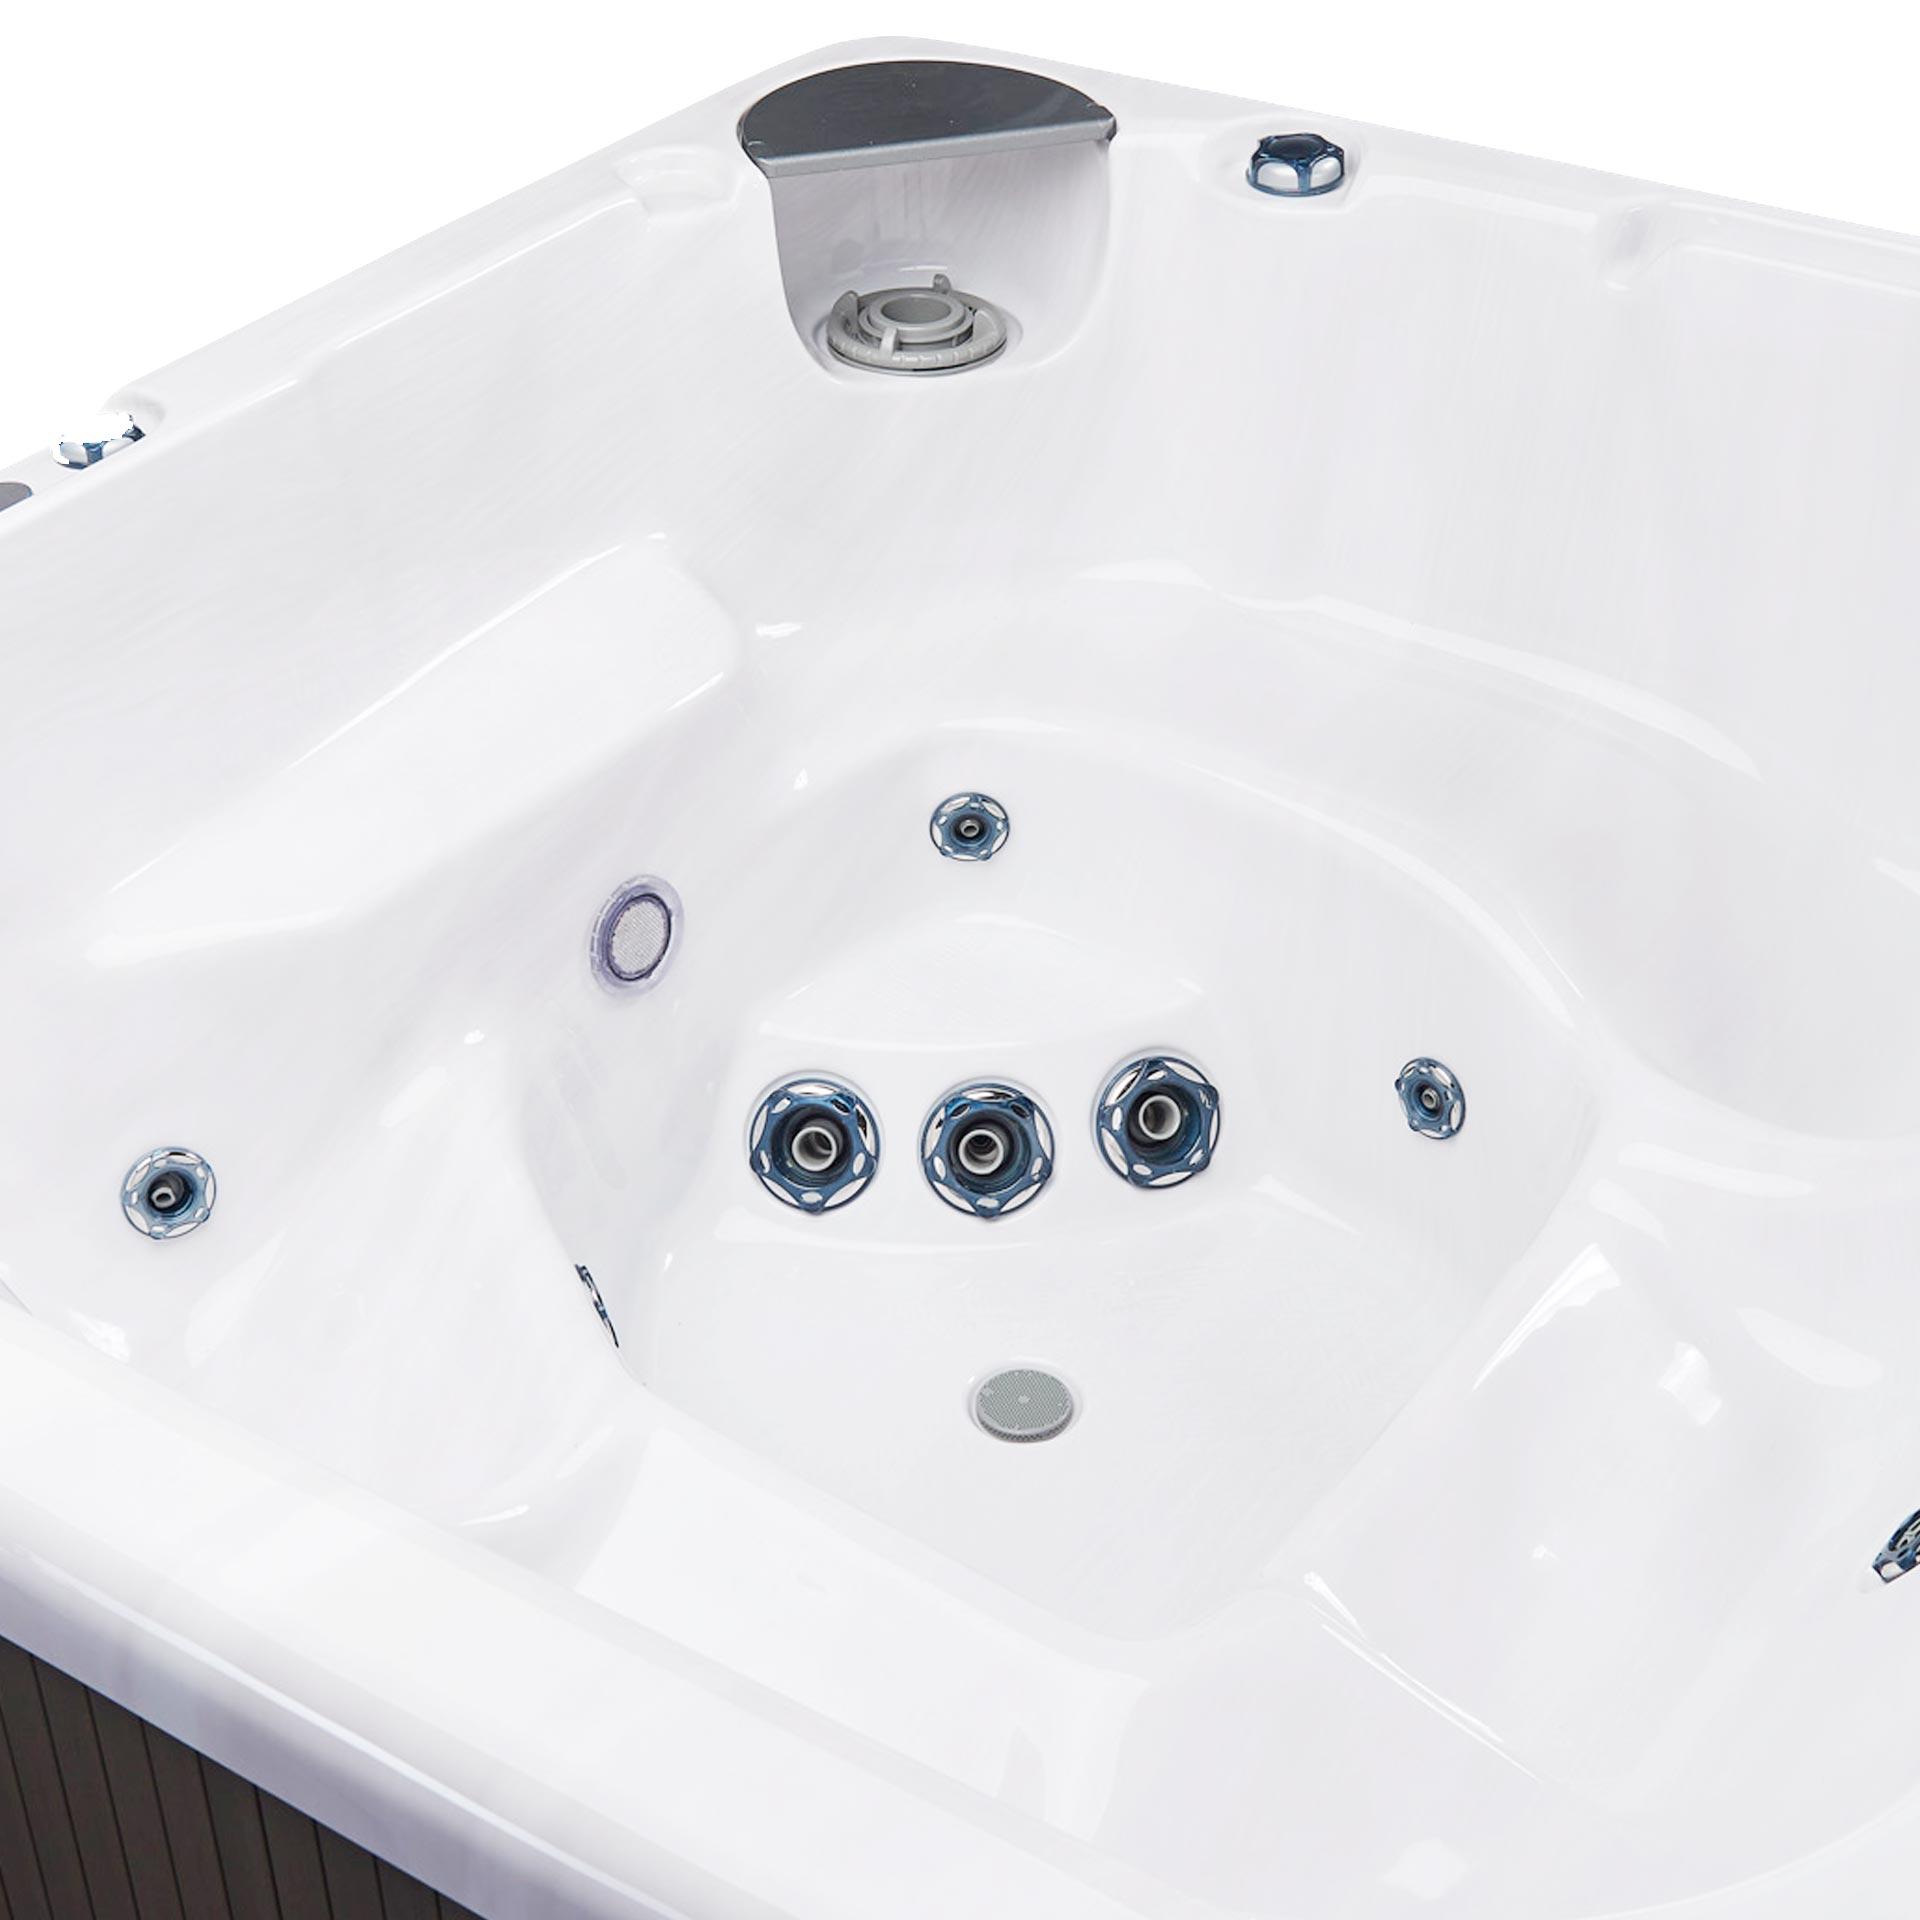 Beachcomber Hot Tub Langley 300 Series